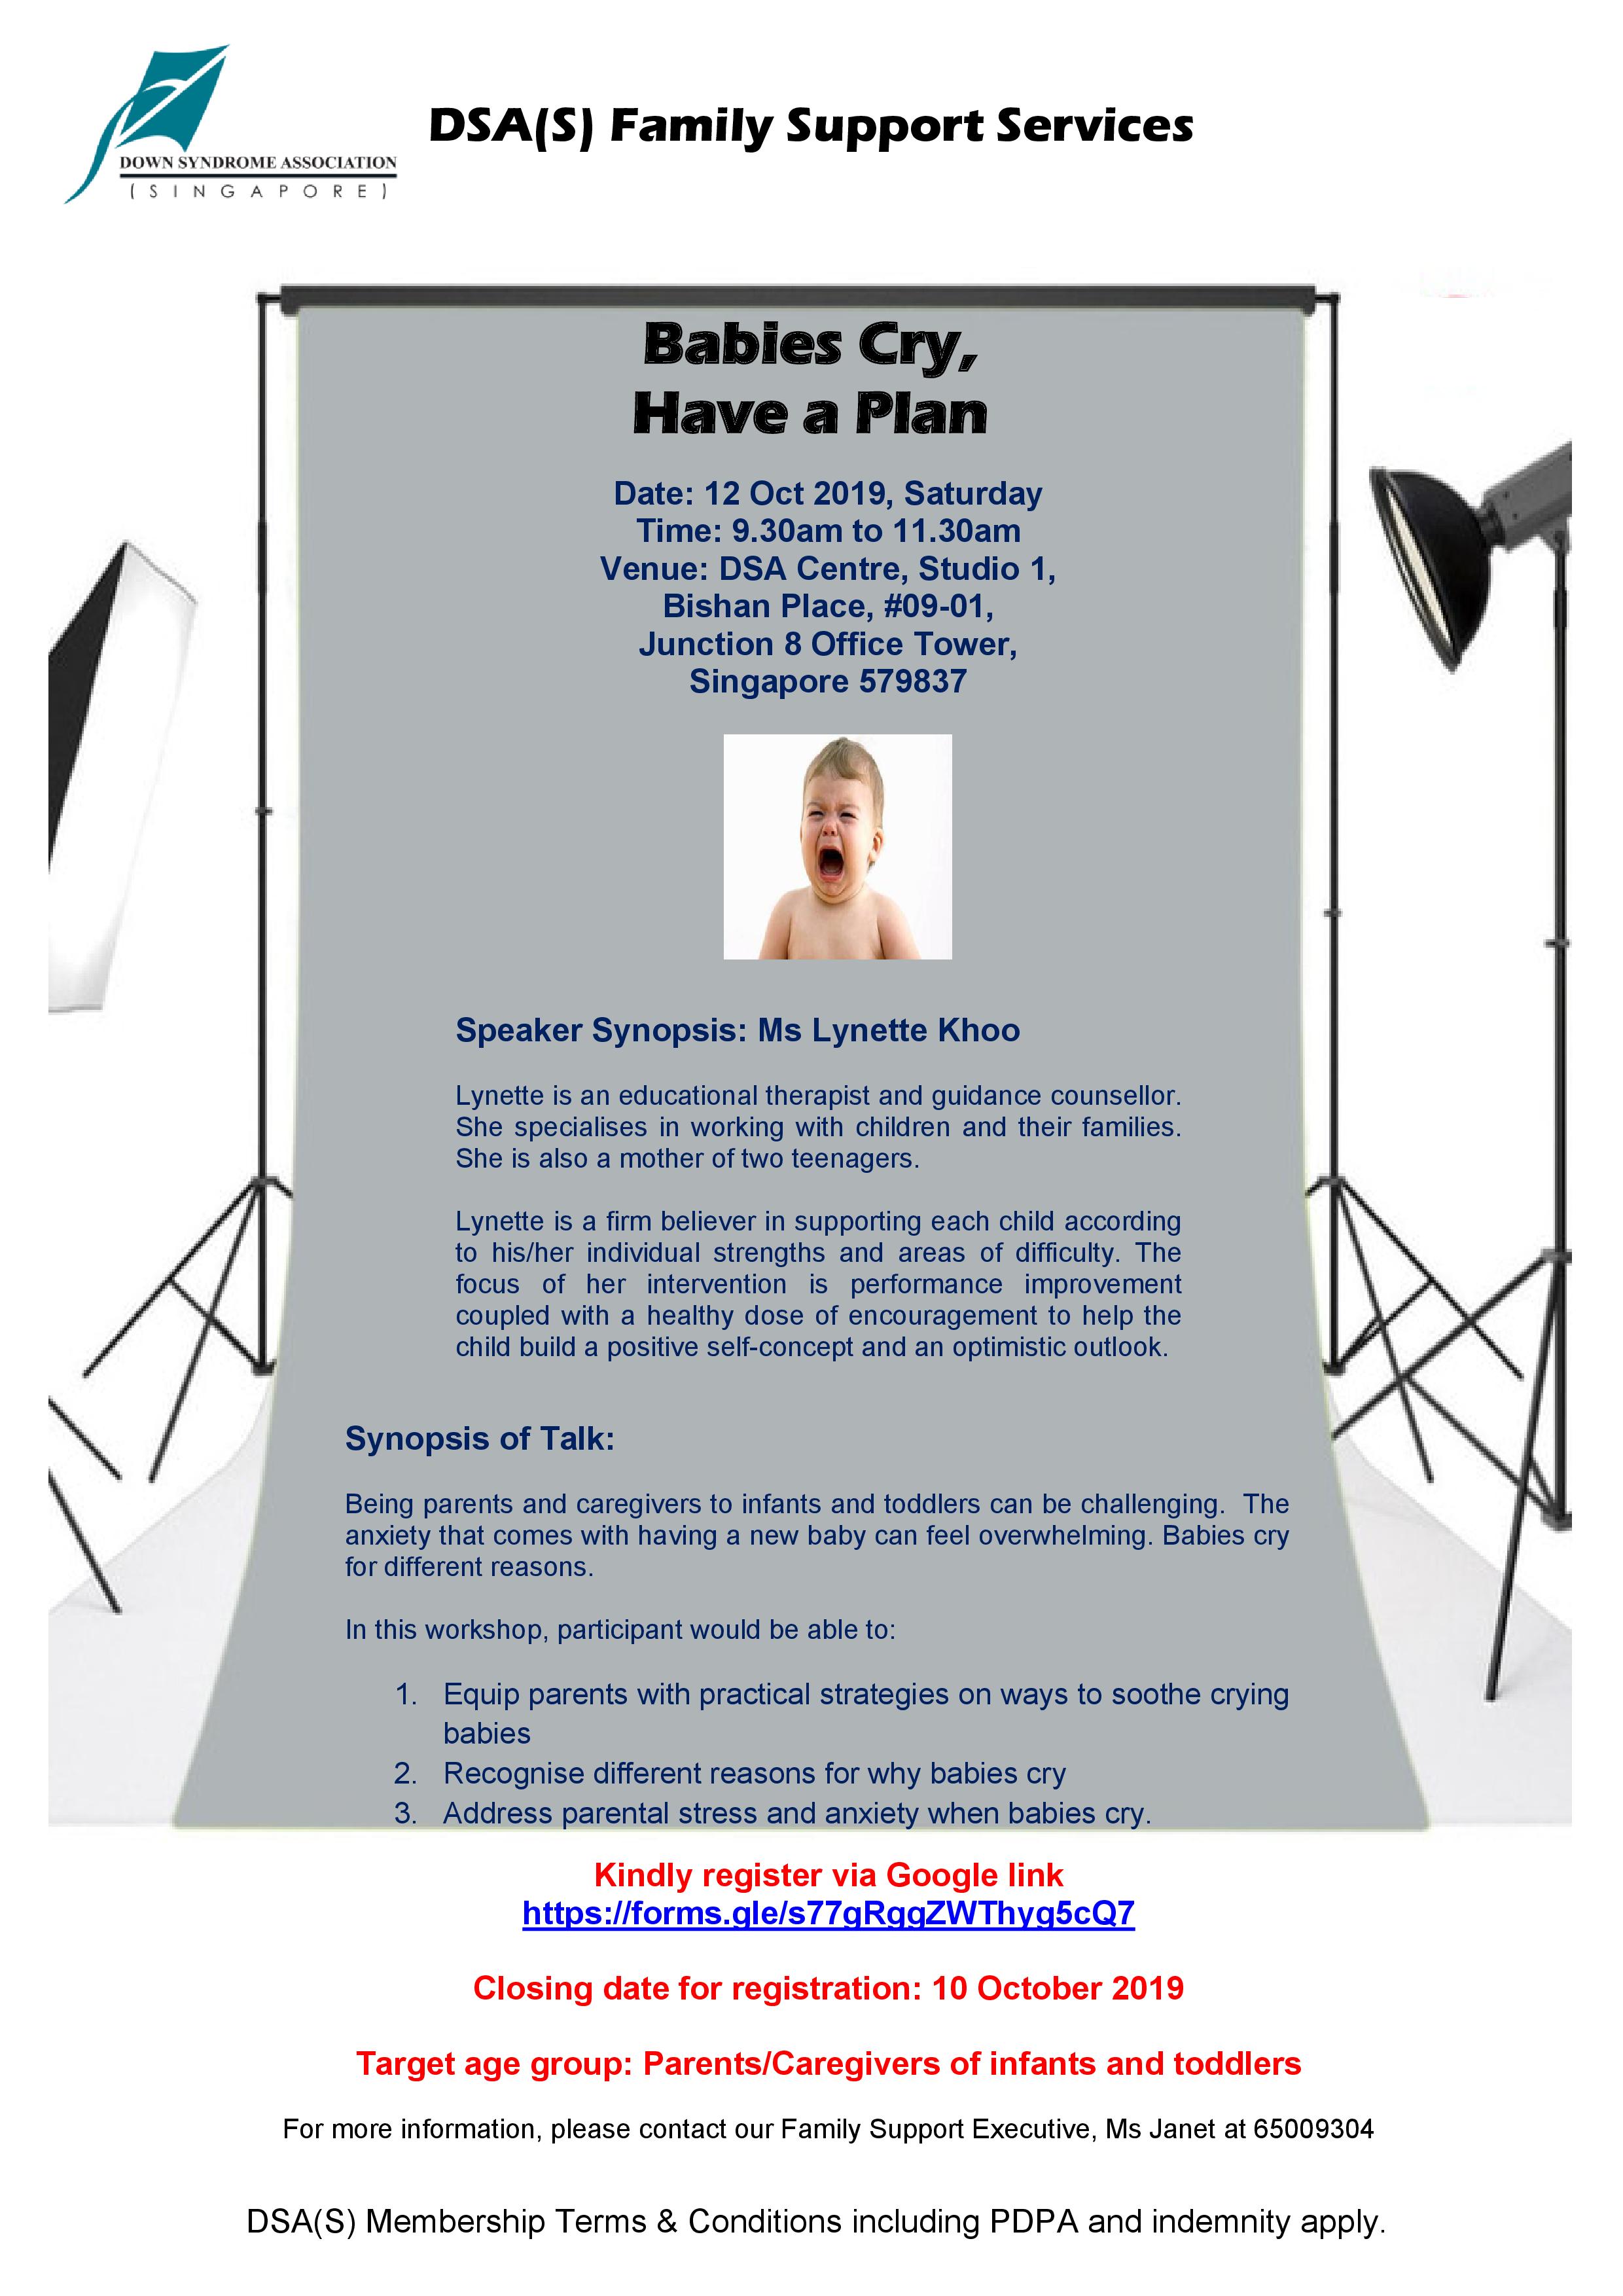 DSA Workshop - Babies Cry, Have A Plan